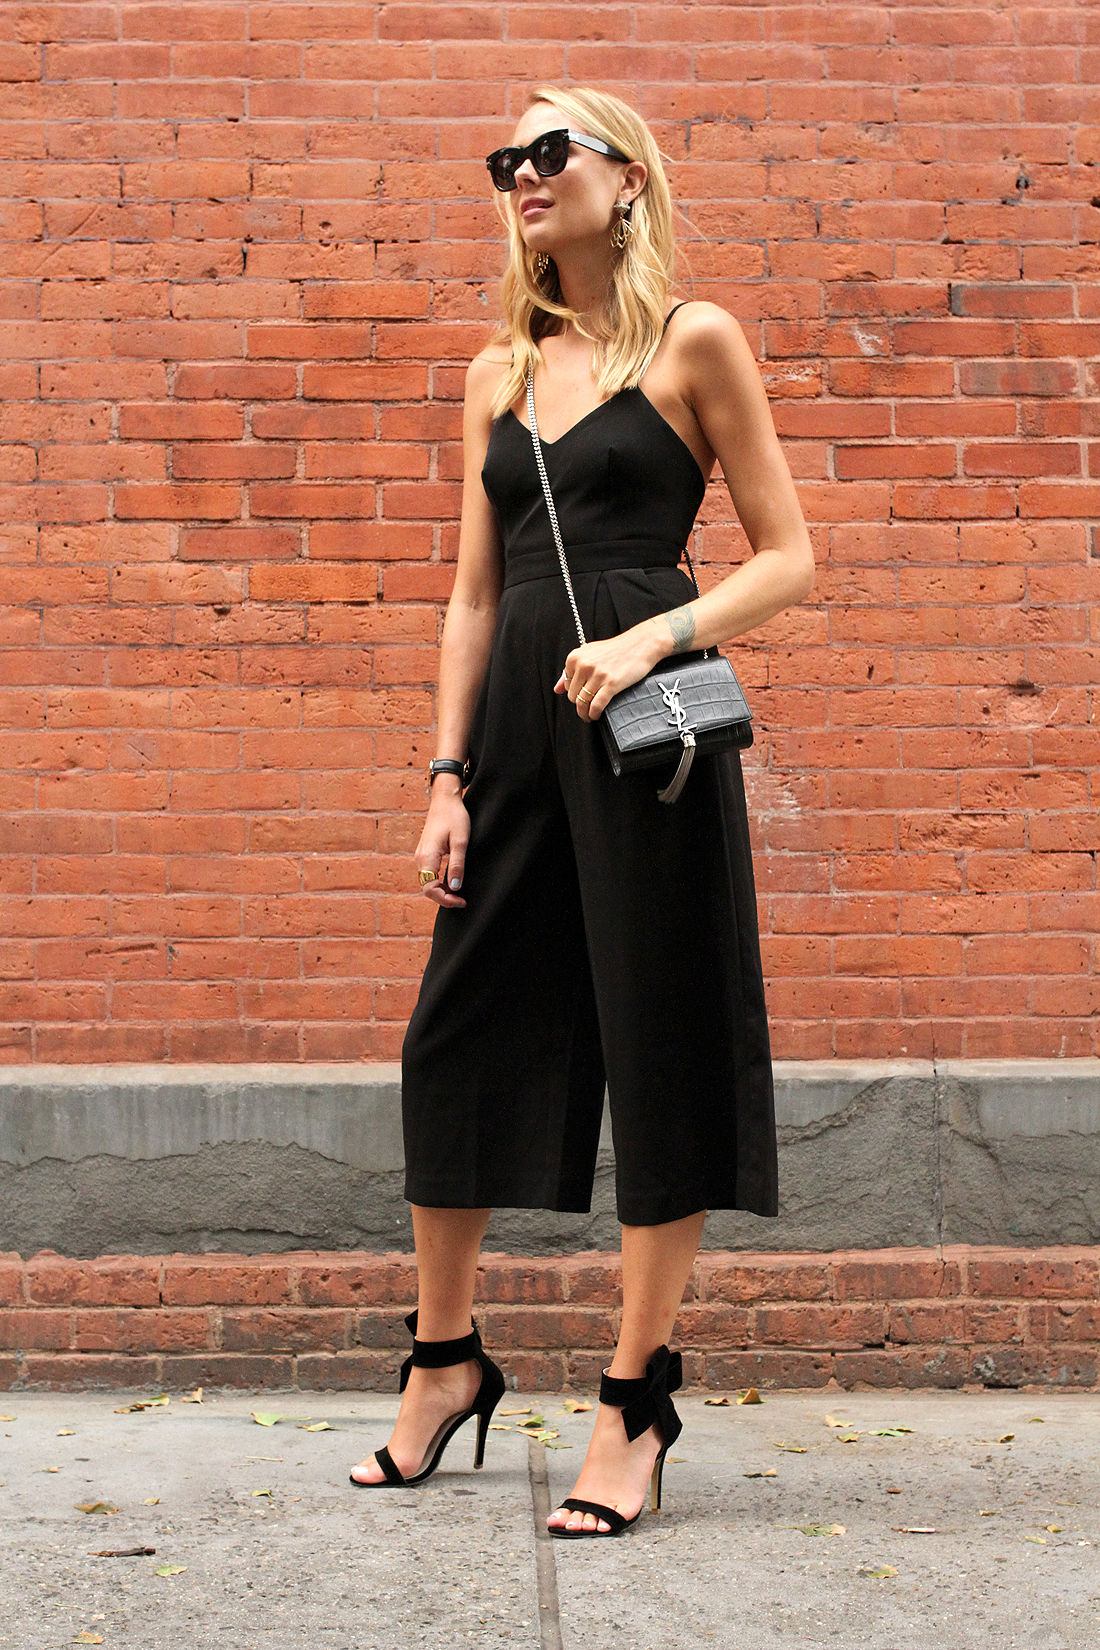 fashion-jackson-cameo-power-trip-jumpsuit-celine-black-sunglasses-saint-laurent-cassandre-crossbody-handbag-black-bow-heels-nyfw-street-style